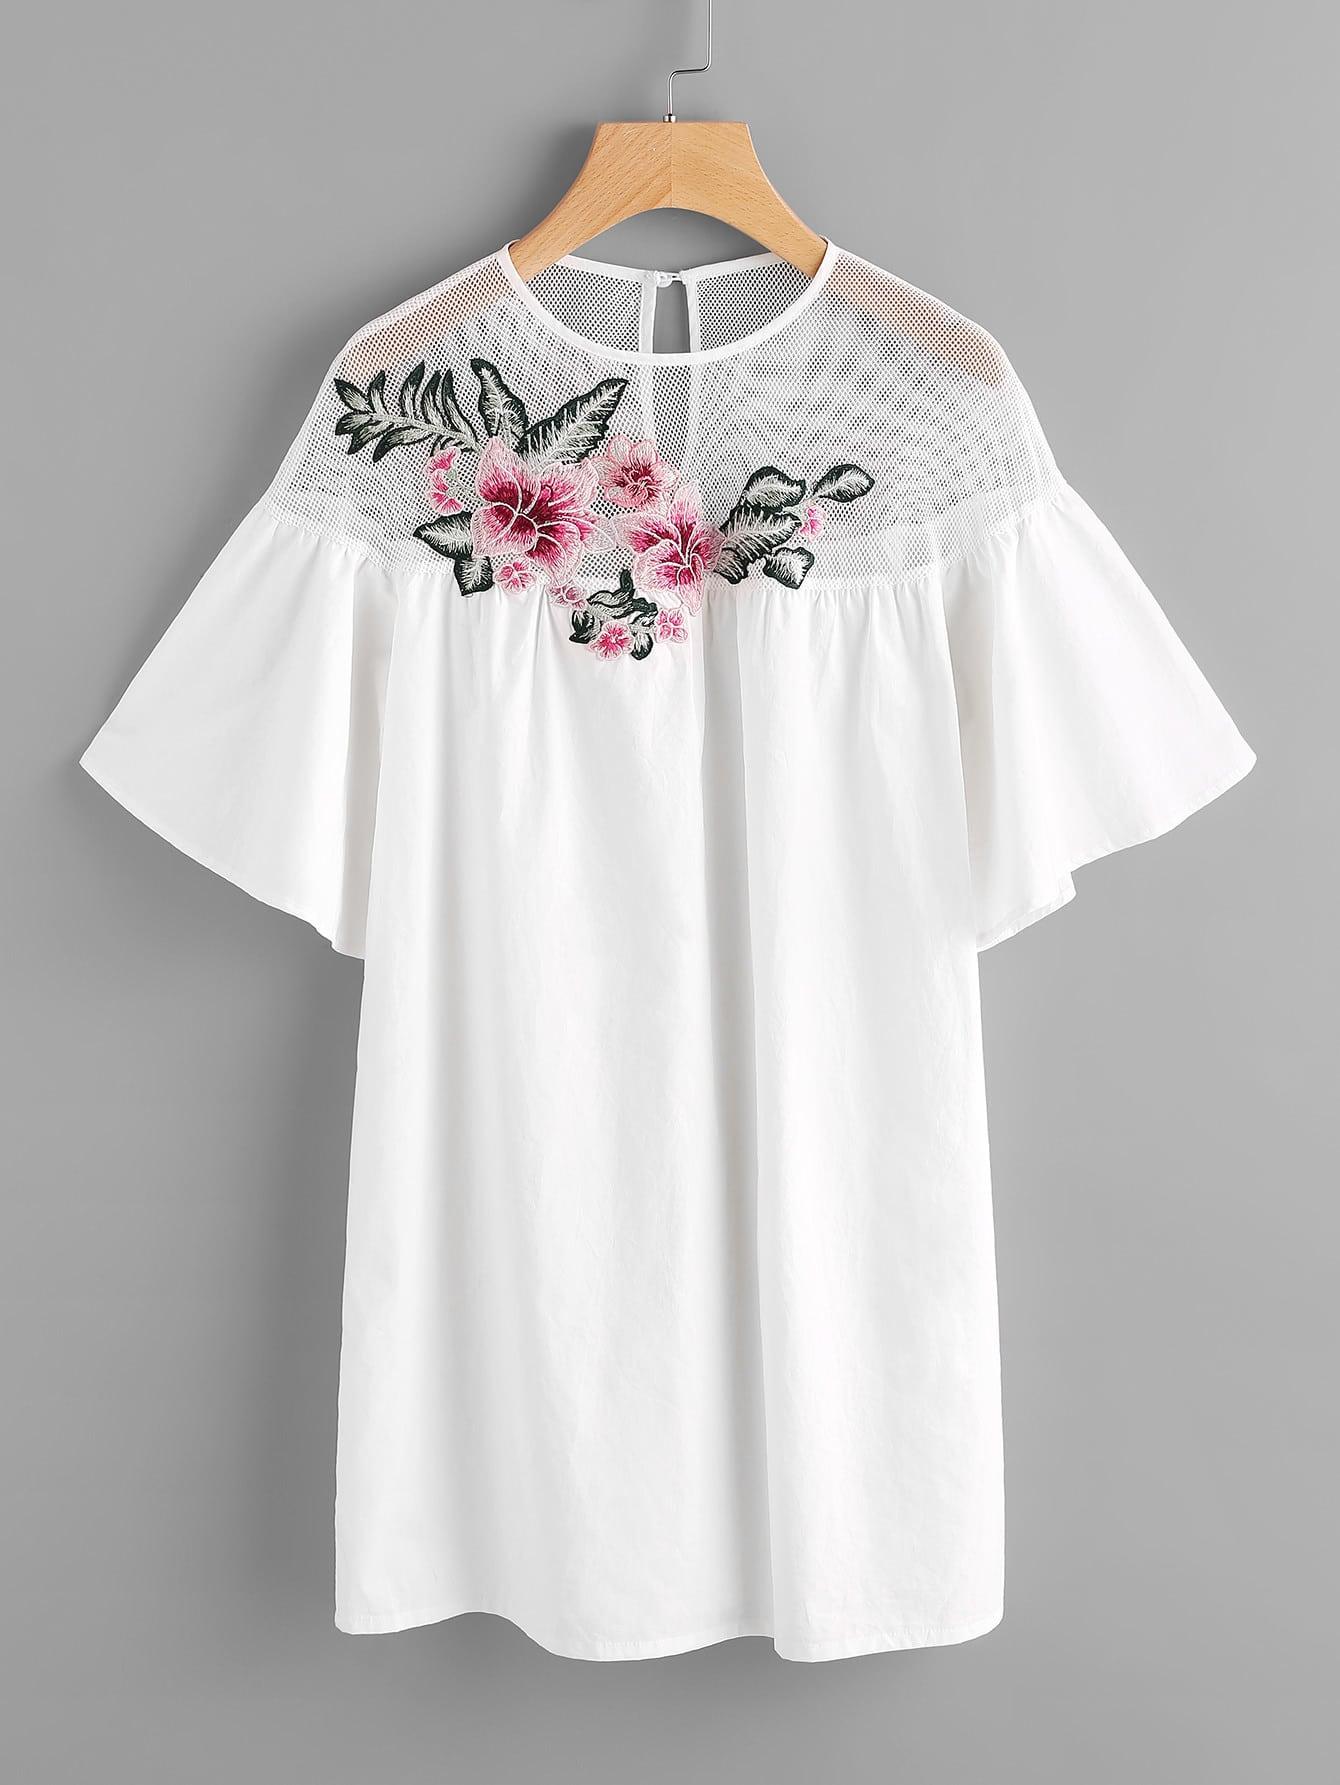 Фото Embroidered Flower Patch Fishnet Yoke Smock Dress. Купить с доставкой